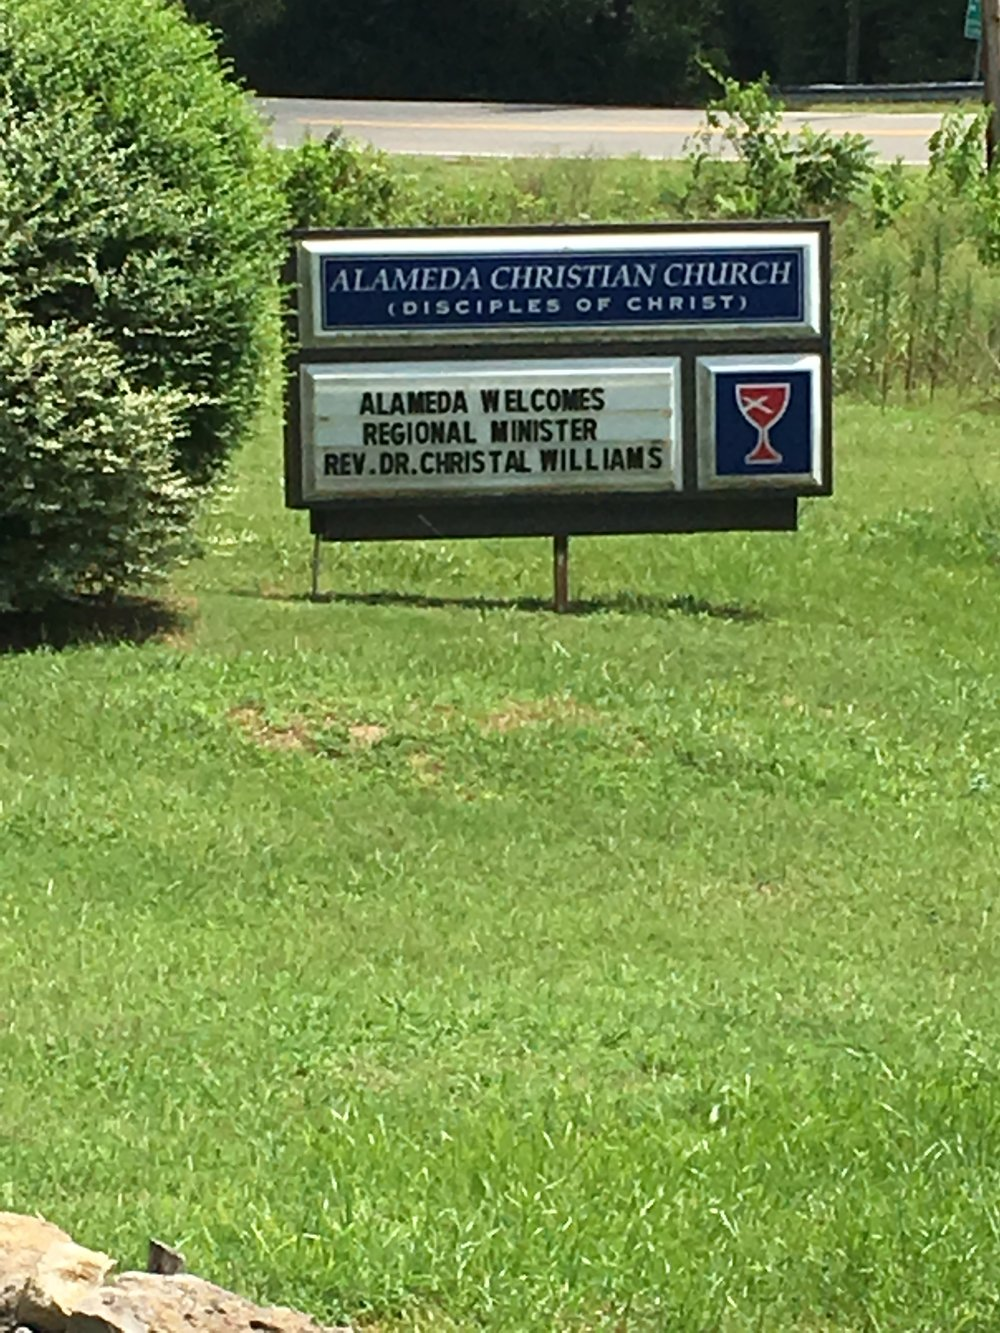 Dr. Williams visits Alameda Christian Church 8/7/16